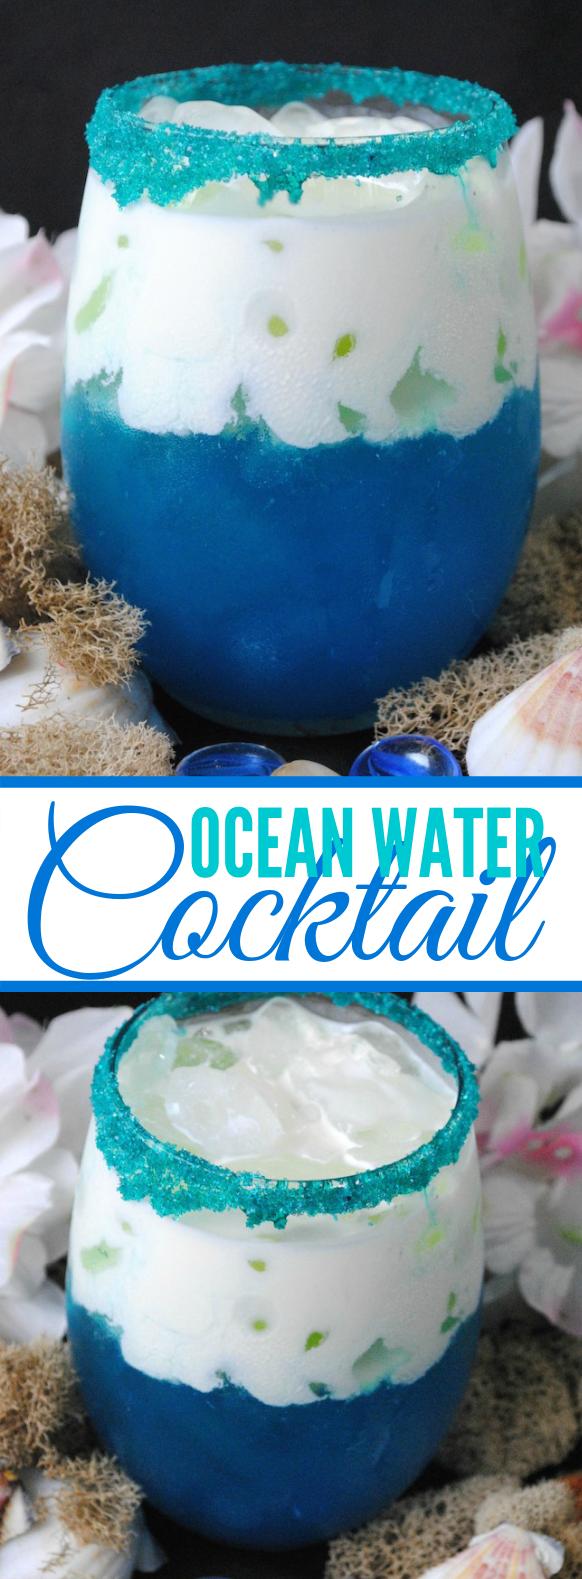 Ocean Water Cocktail Recipe #drinks #summer